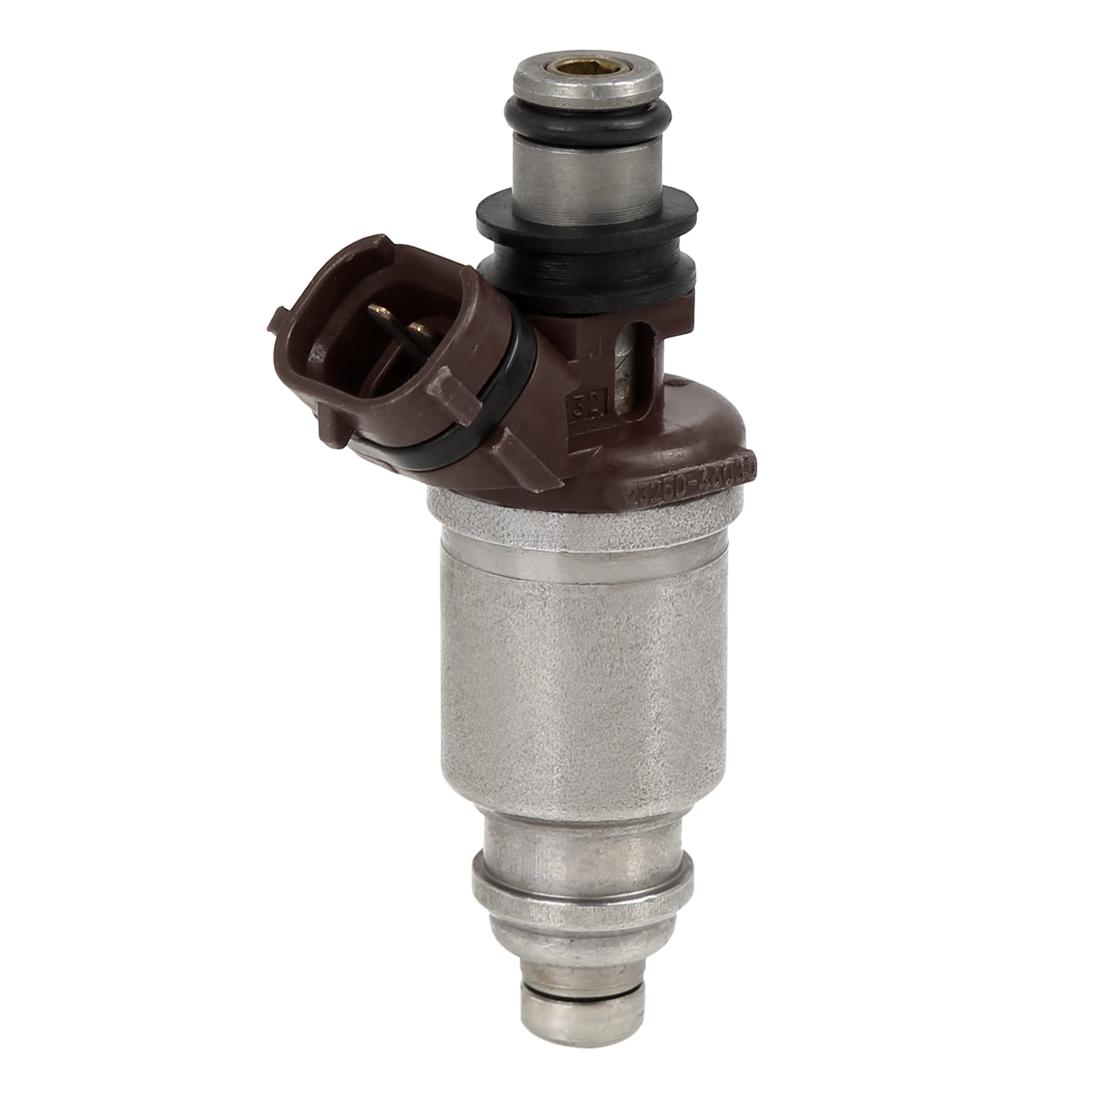 Car Flow Matched Fuel Injector Nozzle 23250-46030 for LEXUS SC300 1992 3.0